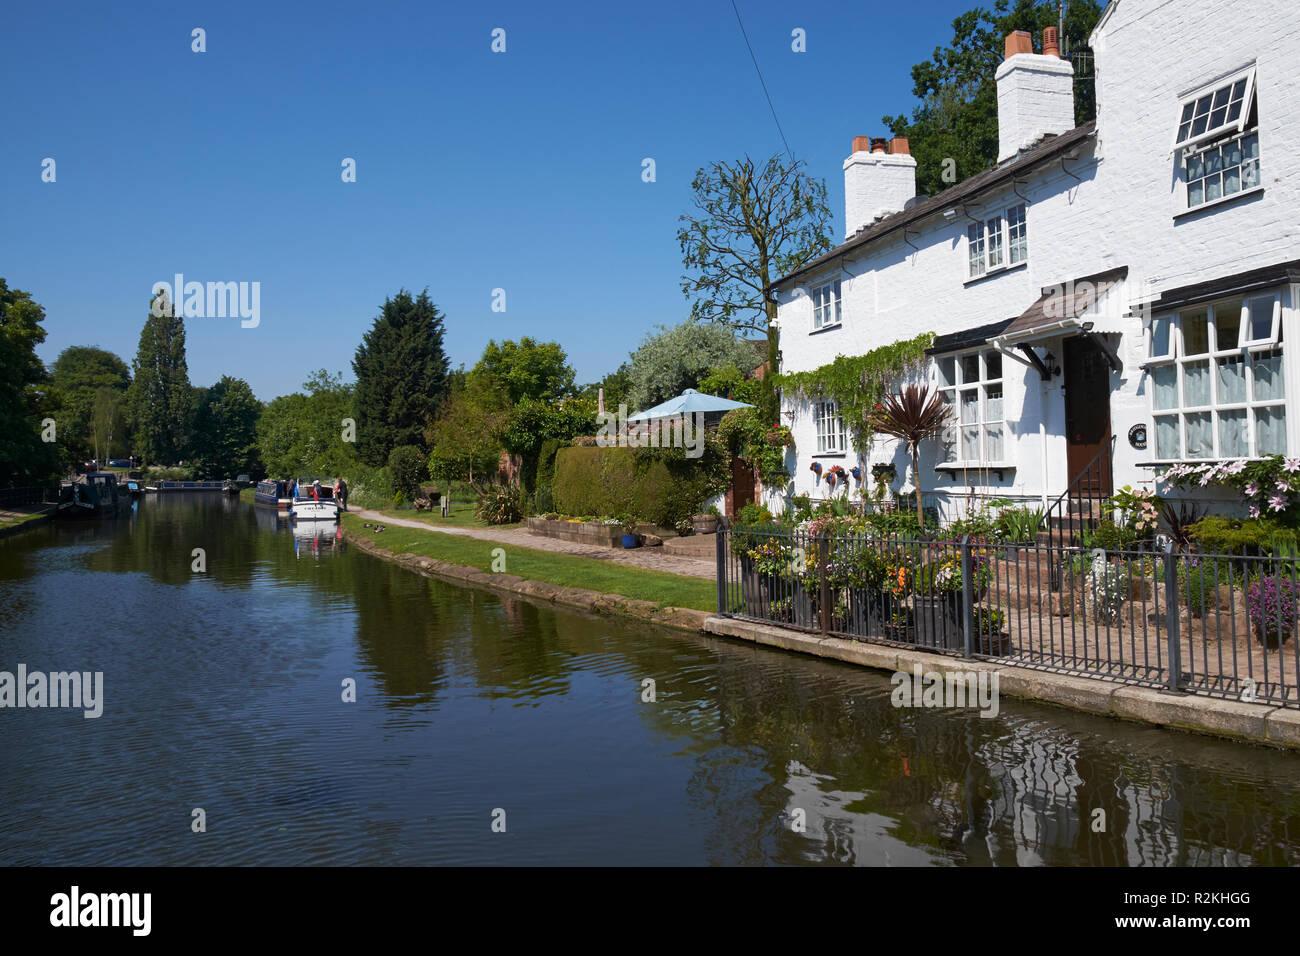 The Bridgewater Canal at Lymm, Cheshire, UK. - Stock Image